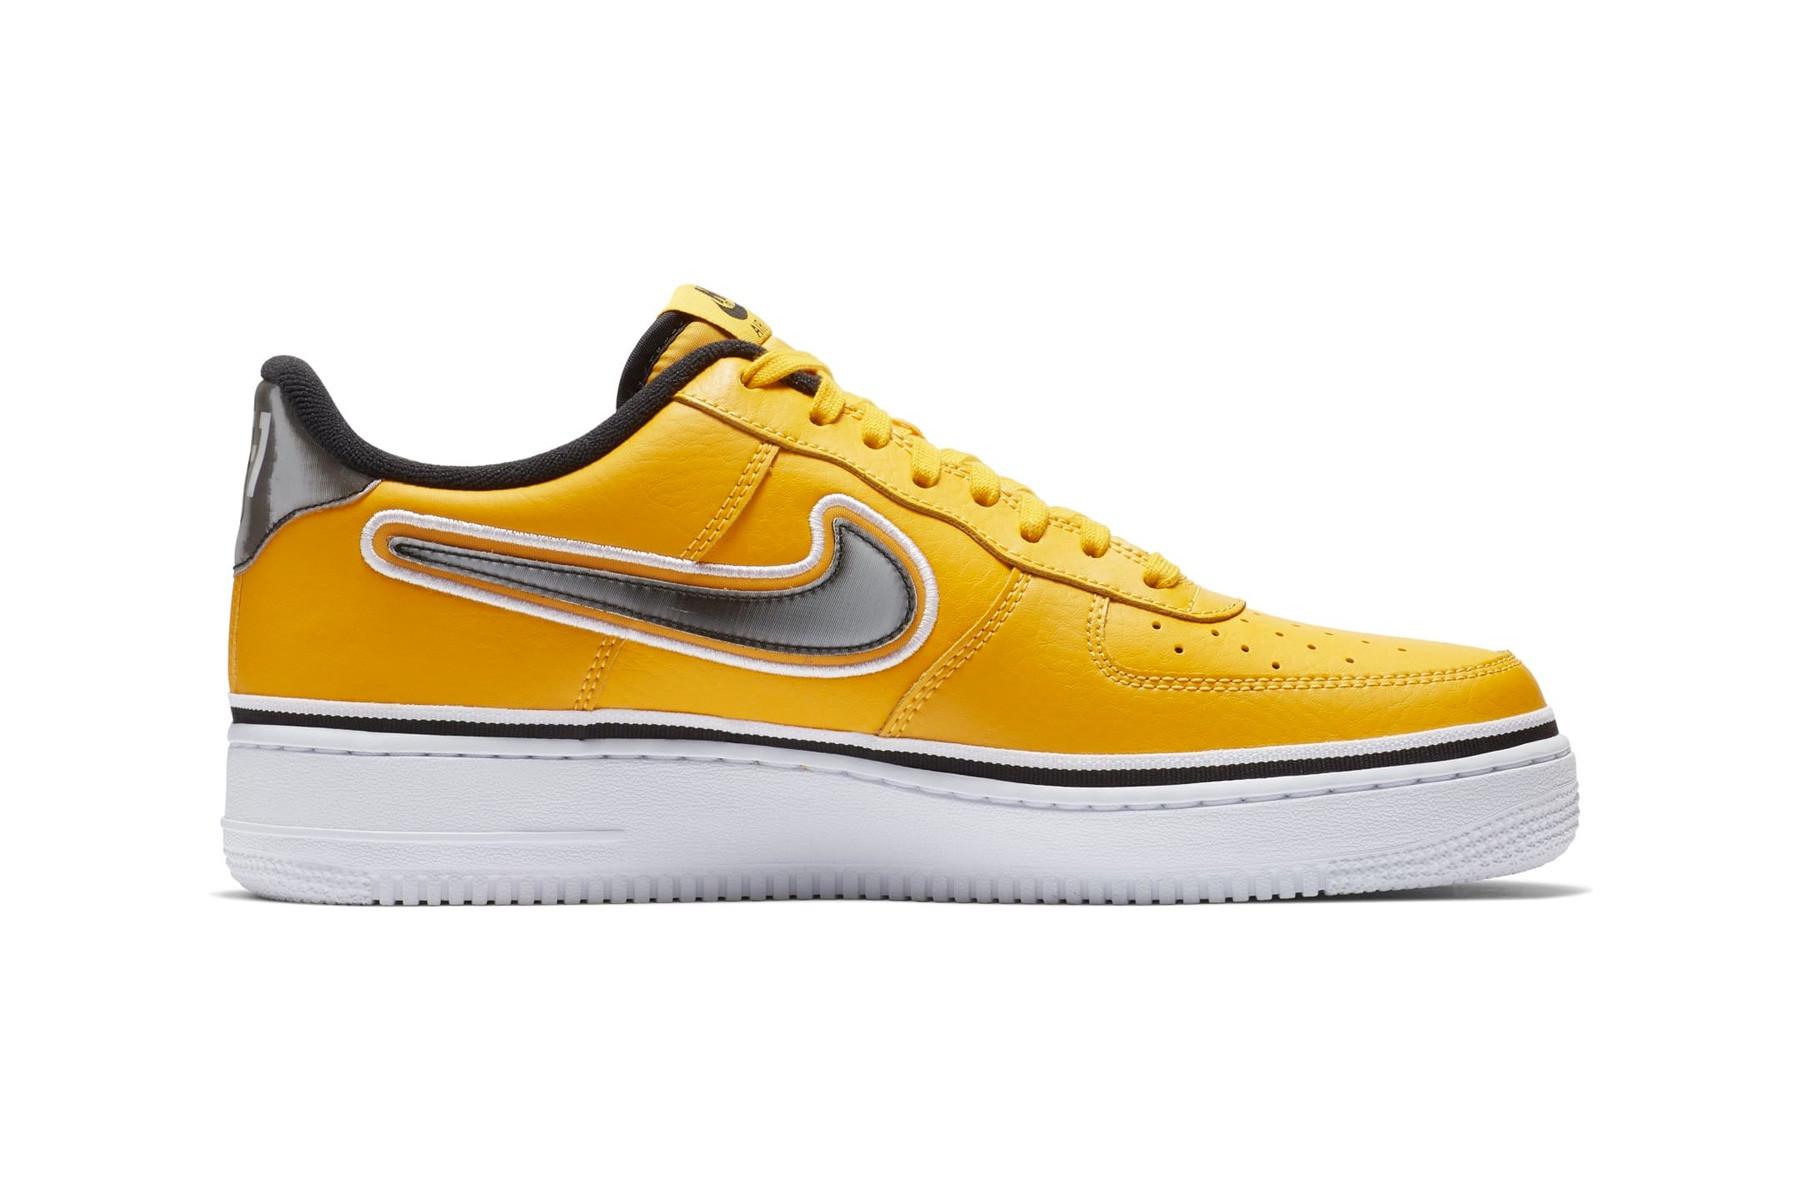 Air X Nike 1 Low Angeles LakersFargolife Force Nba Los n0k8OwP